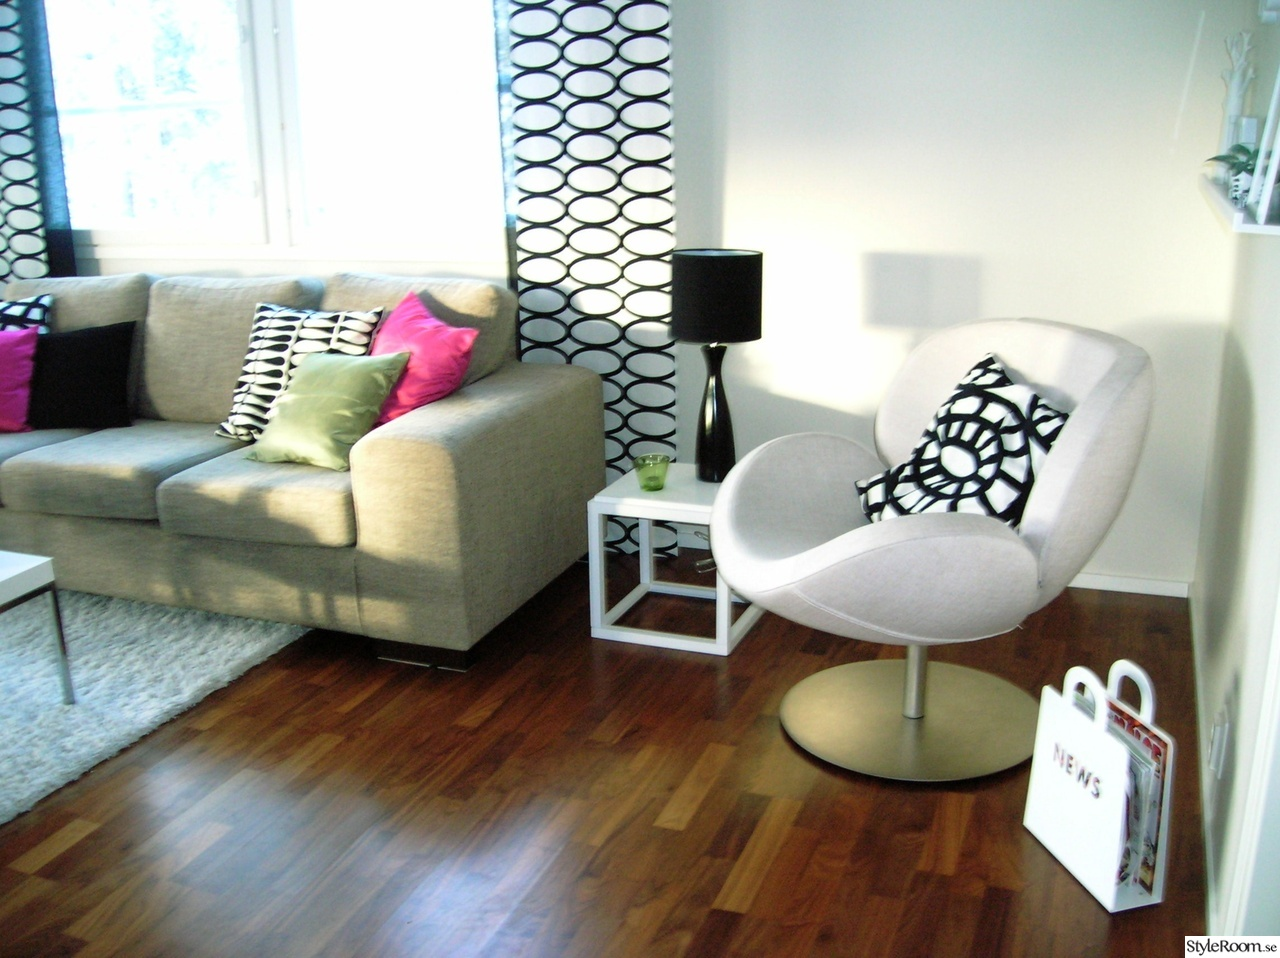 Vardagsrummet i vårt hus Ett inredningsalbum på StyleRoom av Juanita